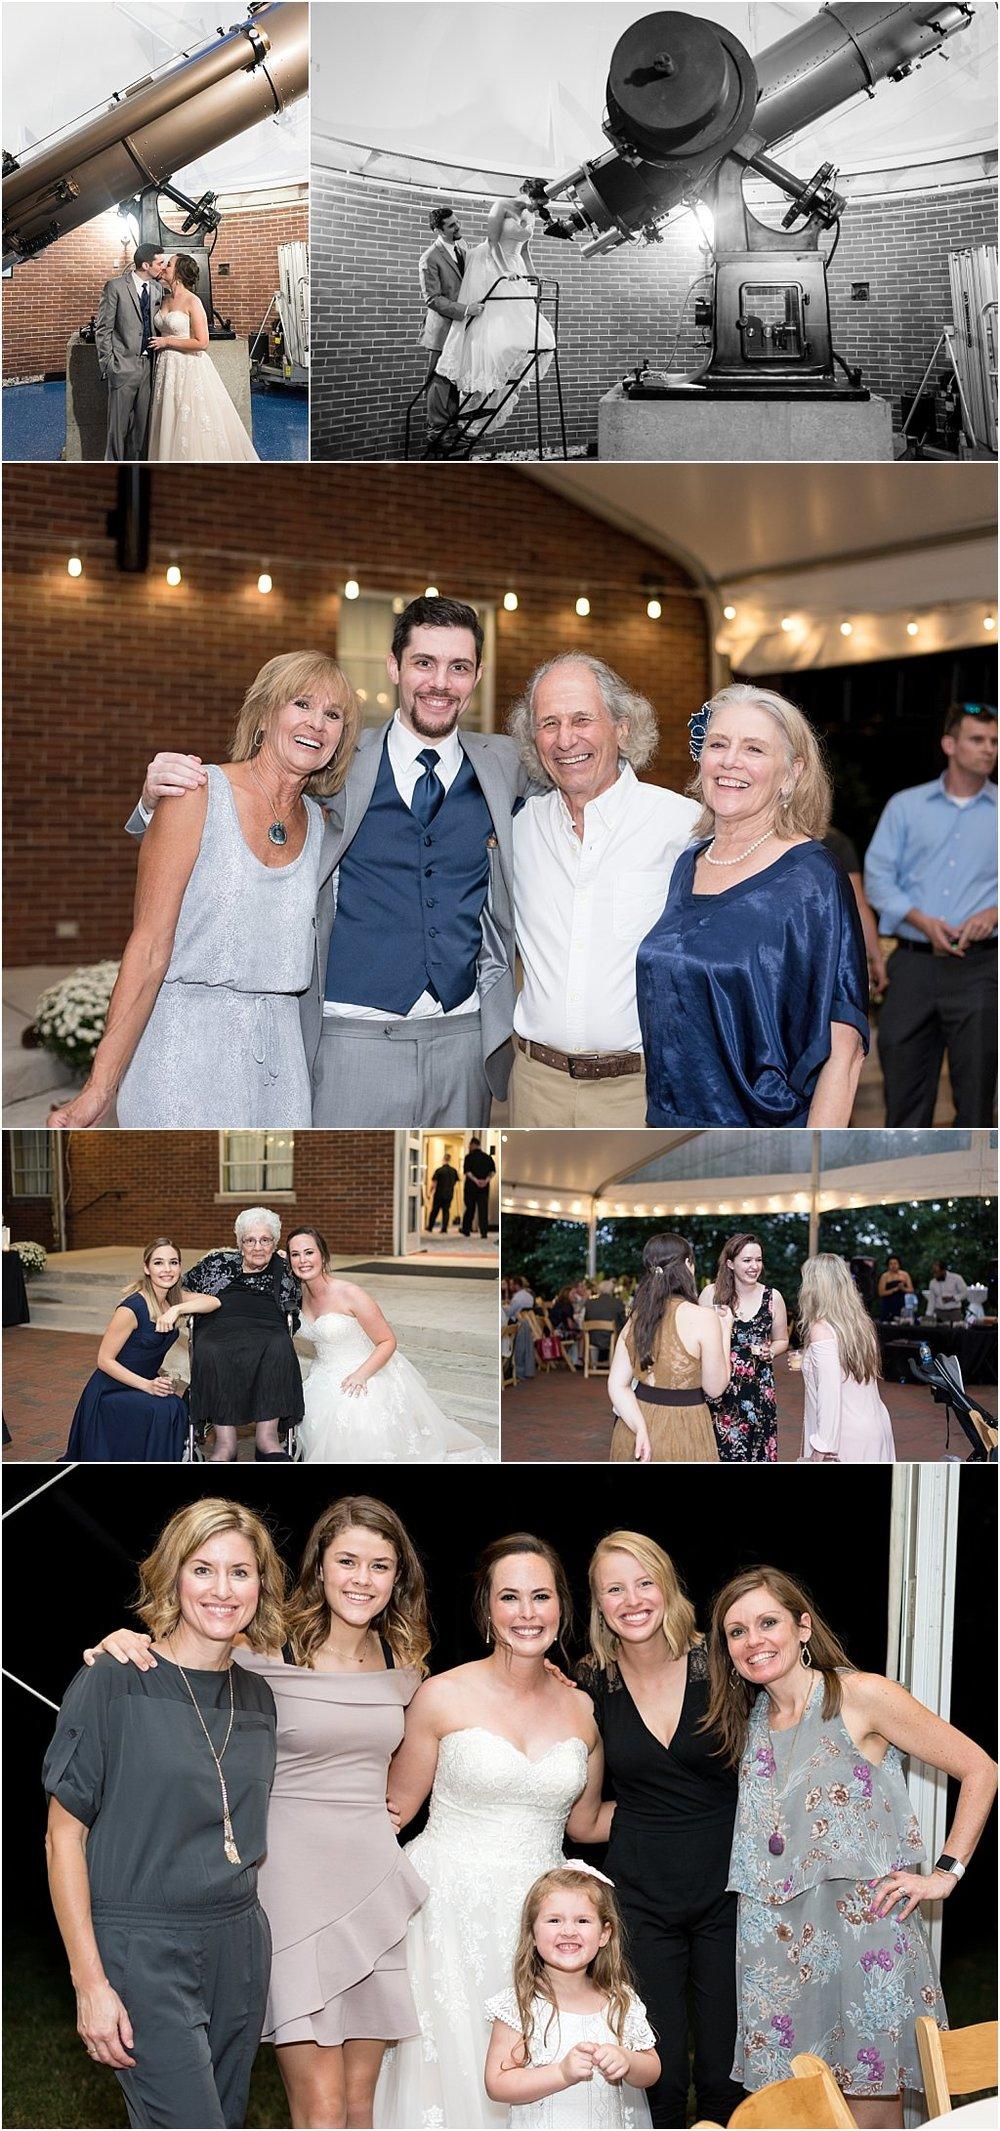 Nolan-And-Leanna-Vanderbilt-Dyer-Observatory-Wedding-in-Brentwood-TN-Nashville-Wedding-Photographers+10